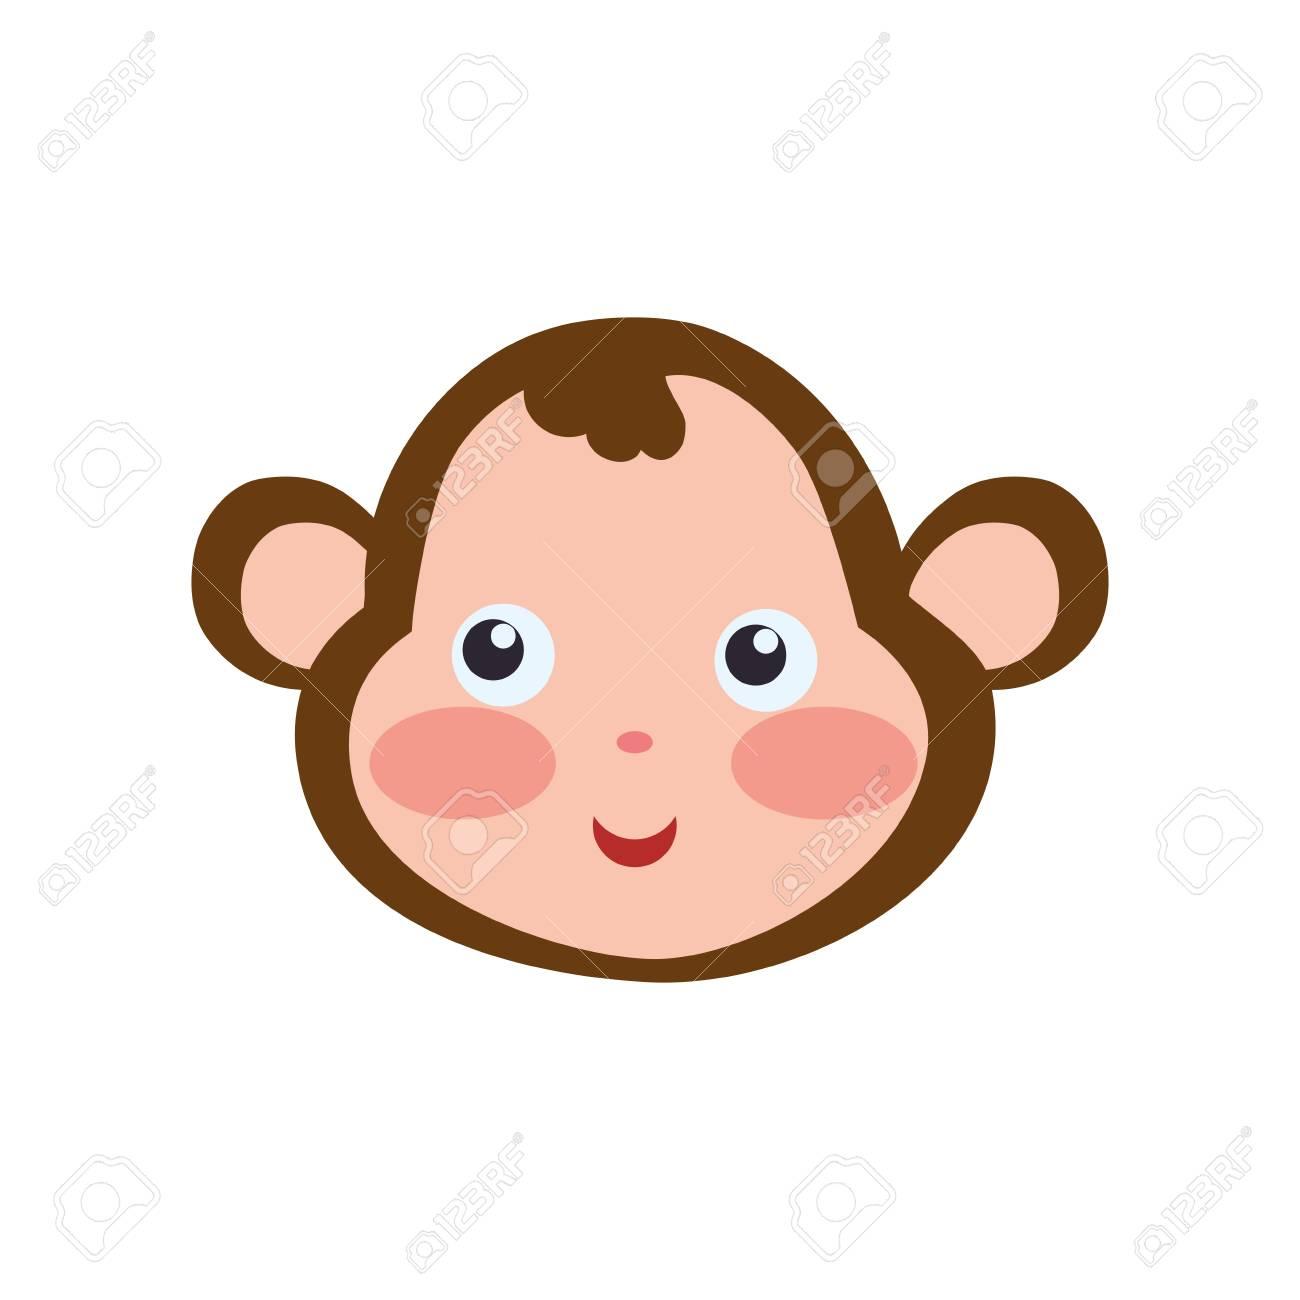 1300x1300 Monkey Cartoon Drawing Head Vector Icon Illustration. Royalty Free